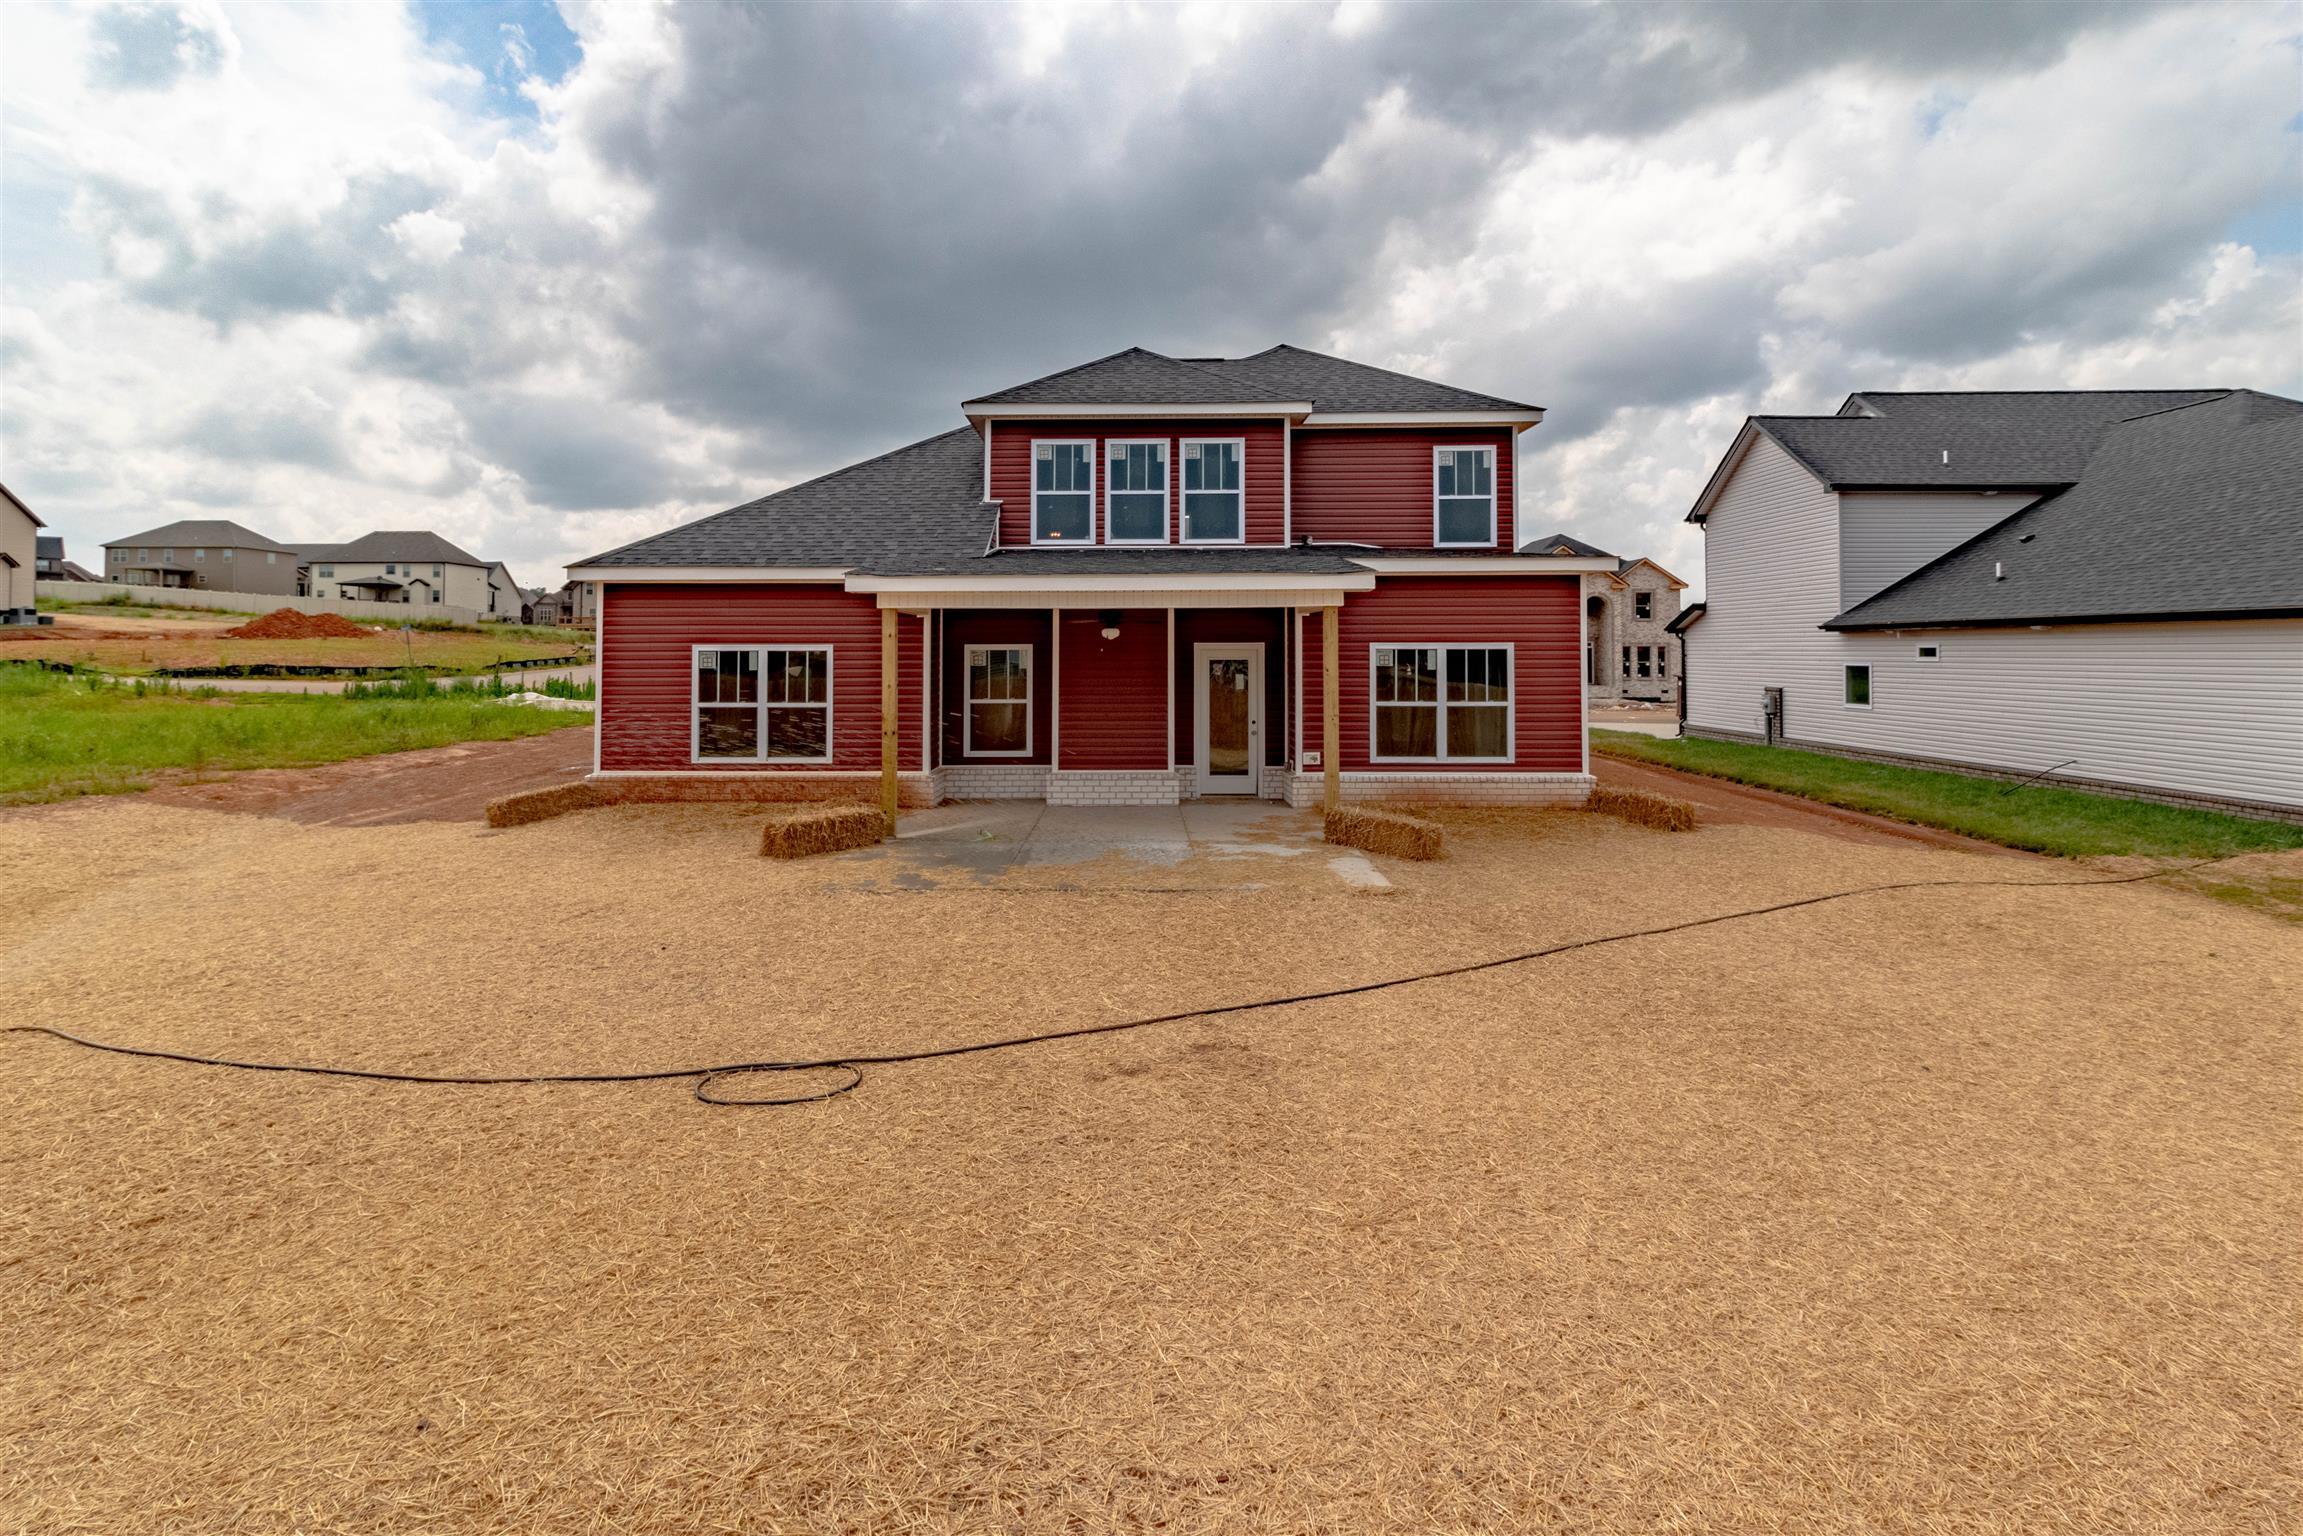 624 Farmington, Clarksville, TN 37043 - Clarksville, TN real estate listing